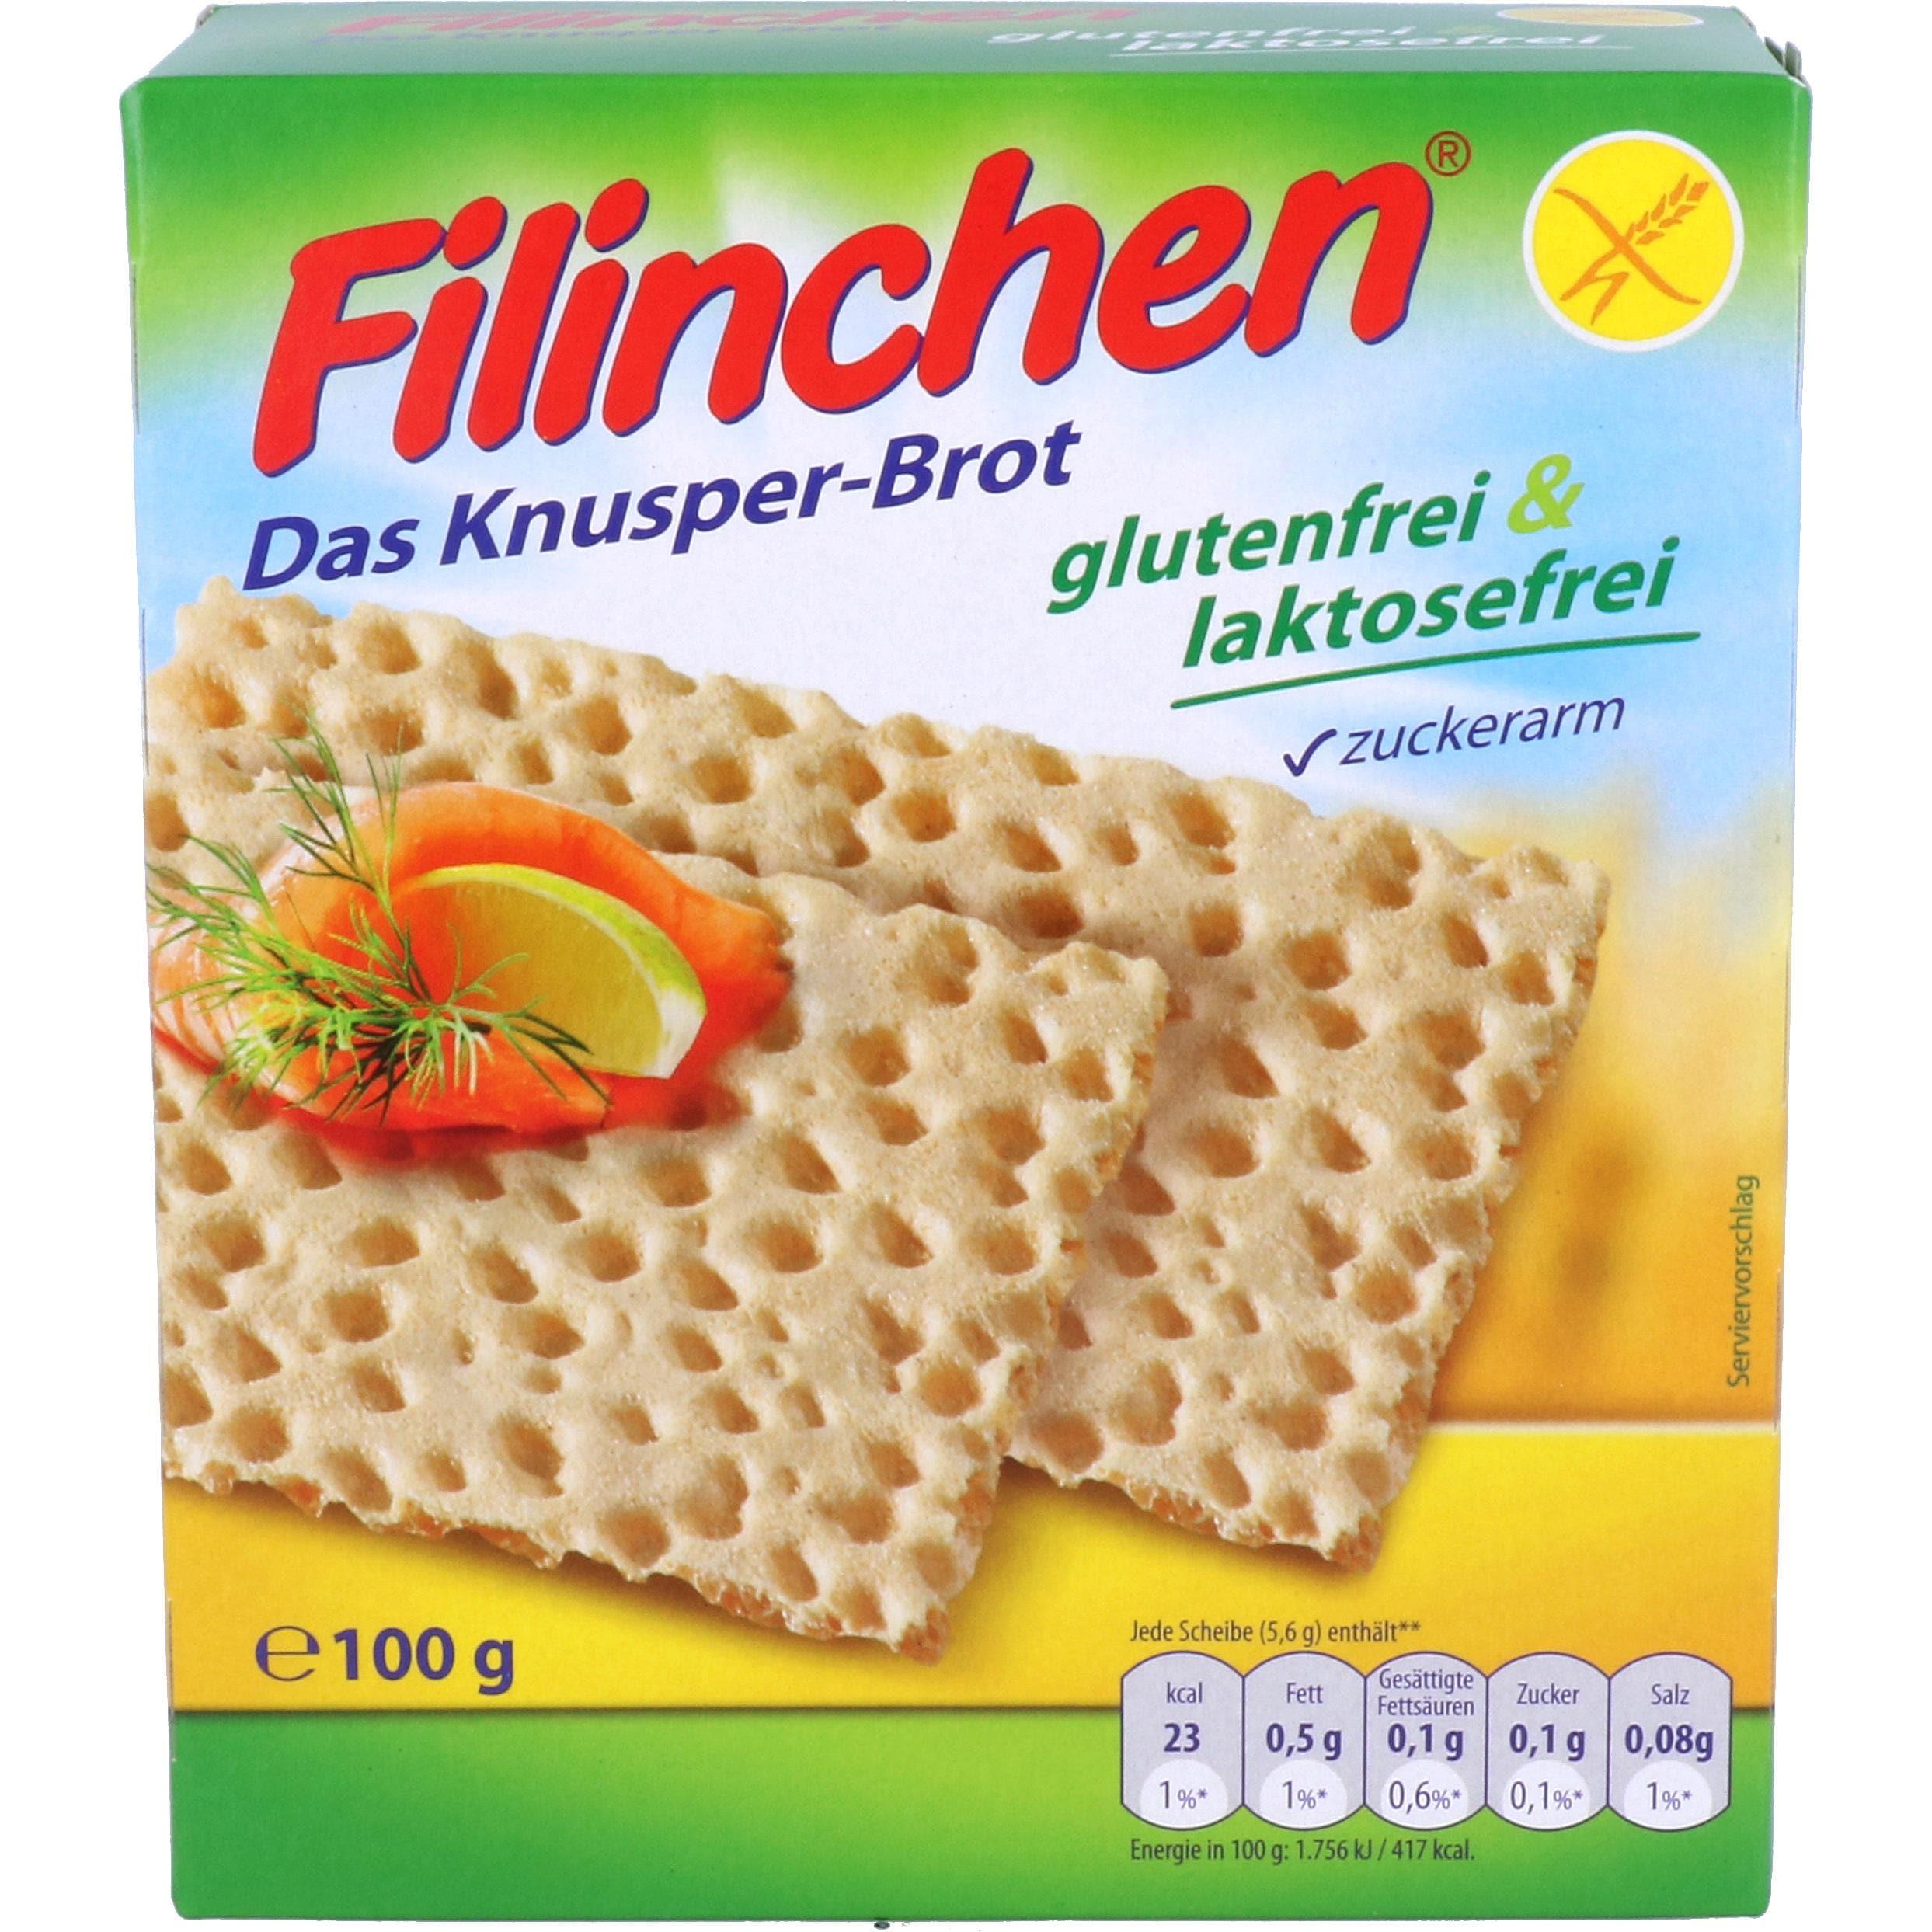 Filinchen Knusper-Brot 100g